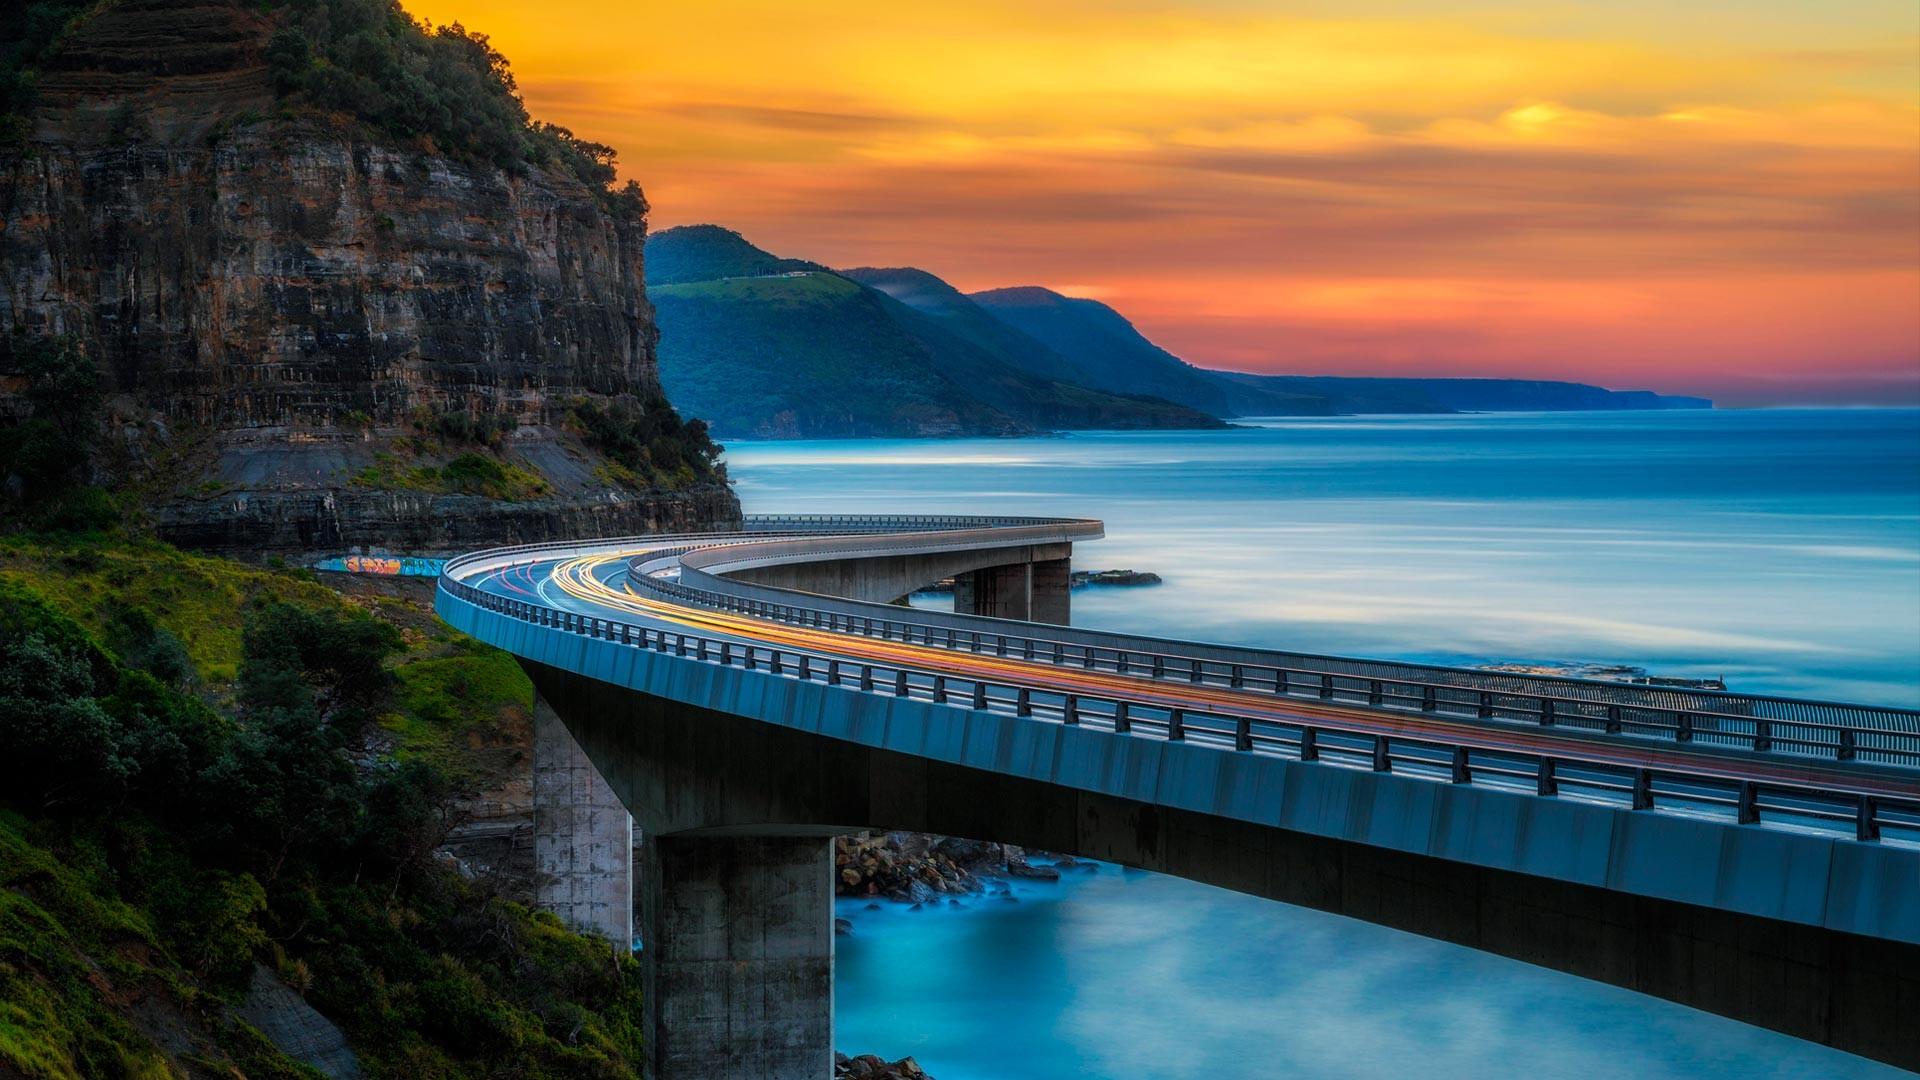 Res: 1920x1080, Sea Cliff Bridge from Bing.com